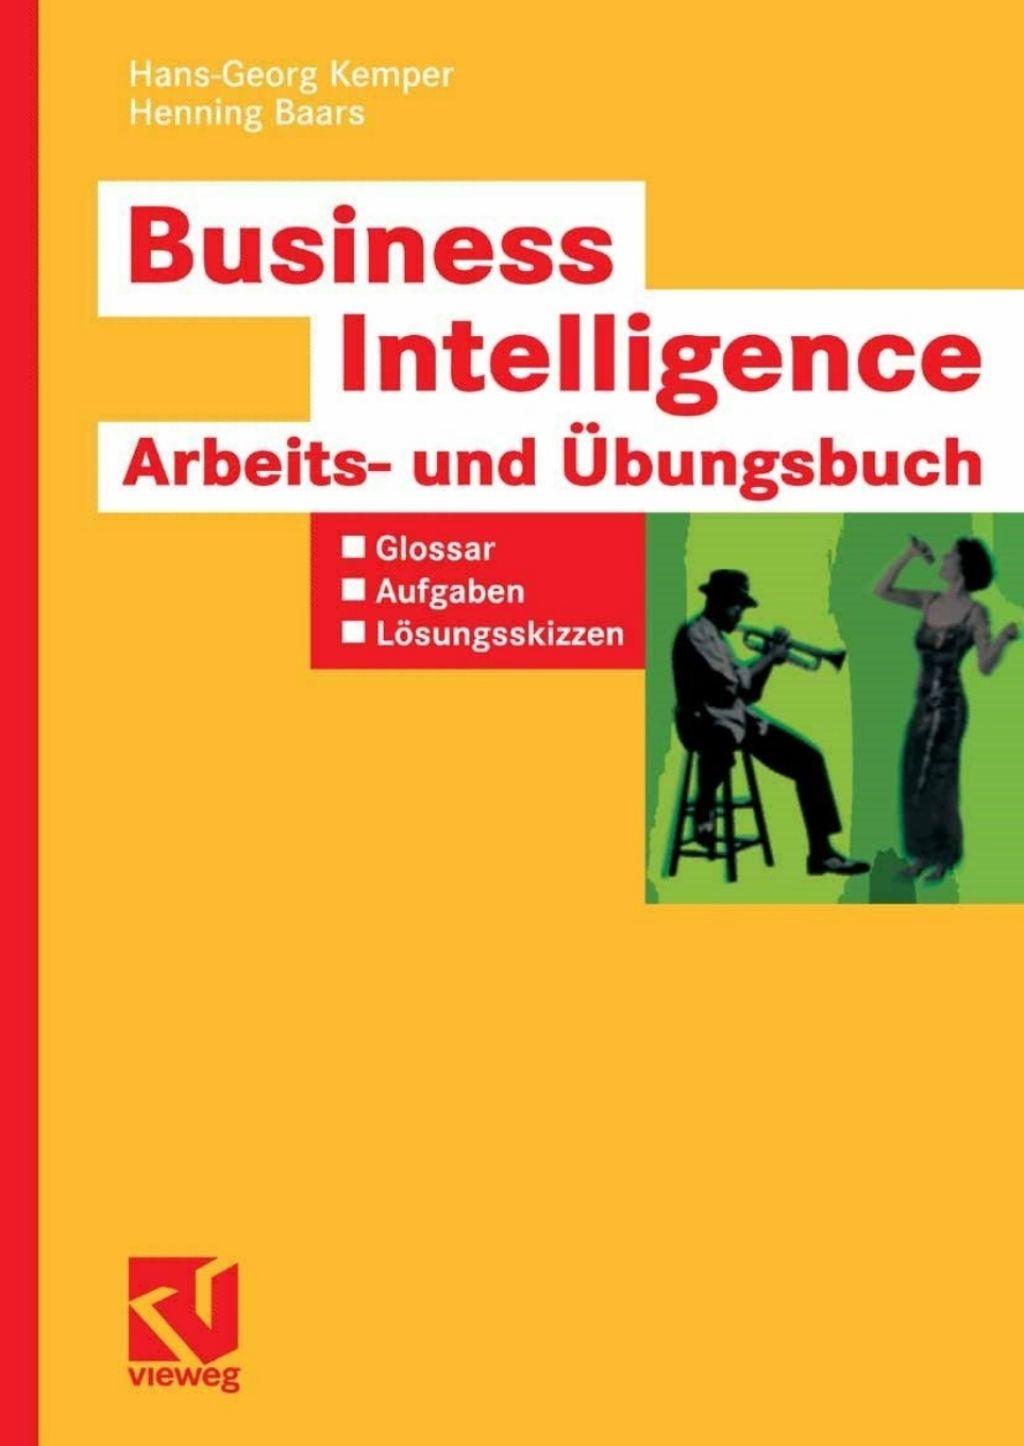 eBook Rental - By Hans-Georg Kemper; Henning Baars PRINT ISBN: 9783834892683 E-TEXT ISBN: 9783834892683 Edition: 0